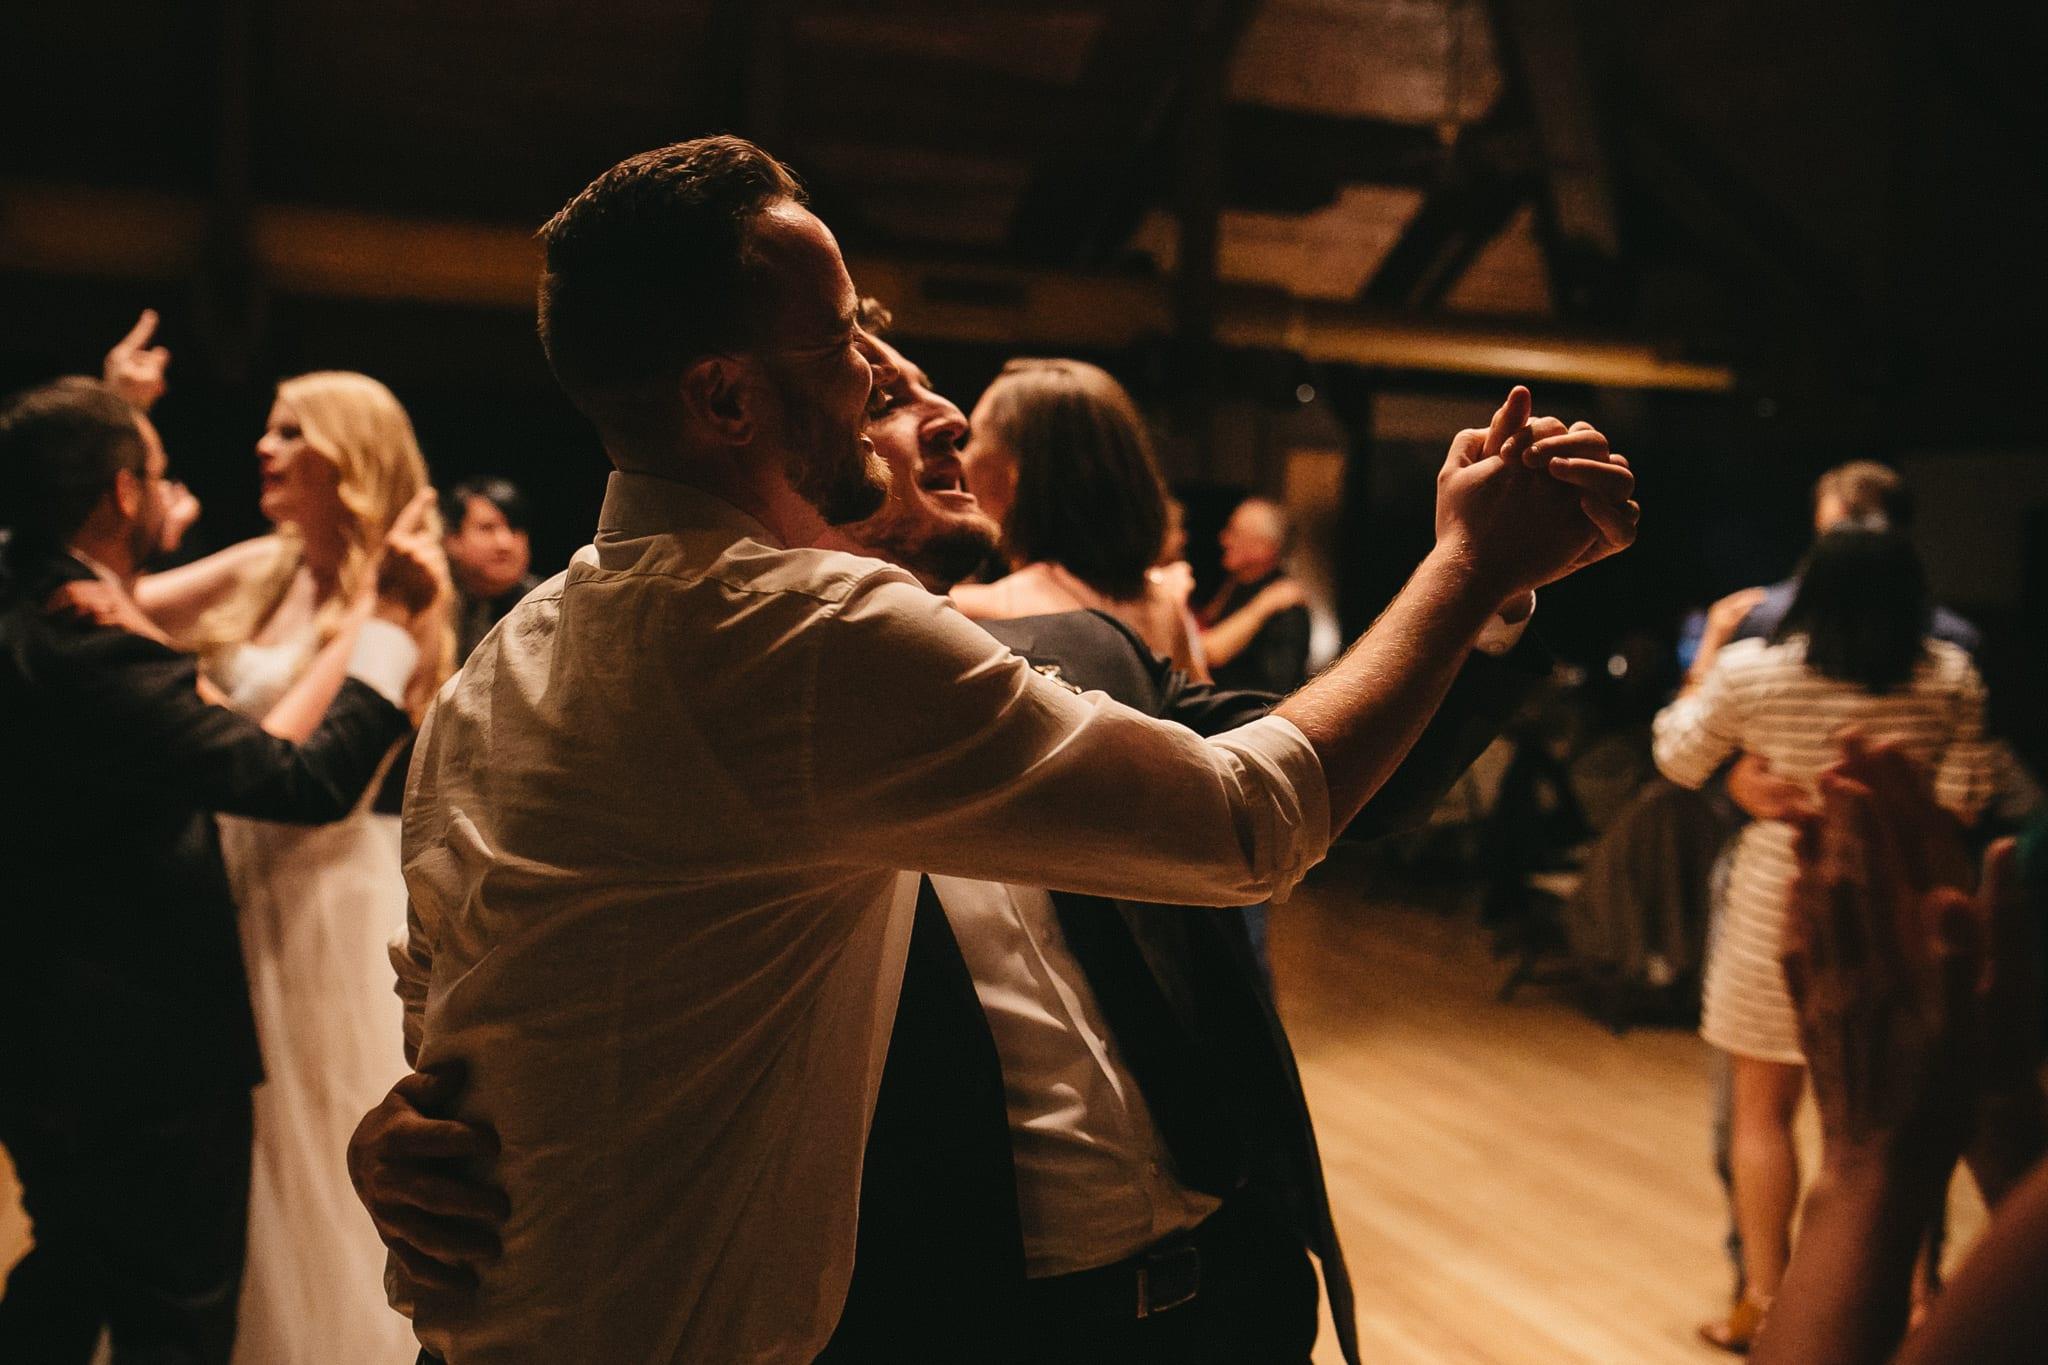 chico-card-center-wedding-photographer-58